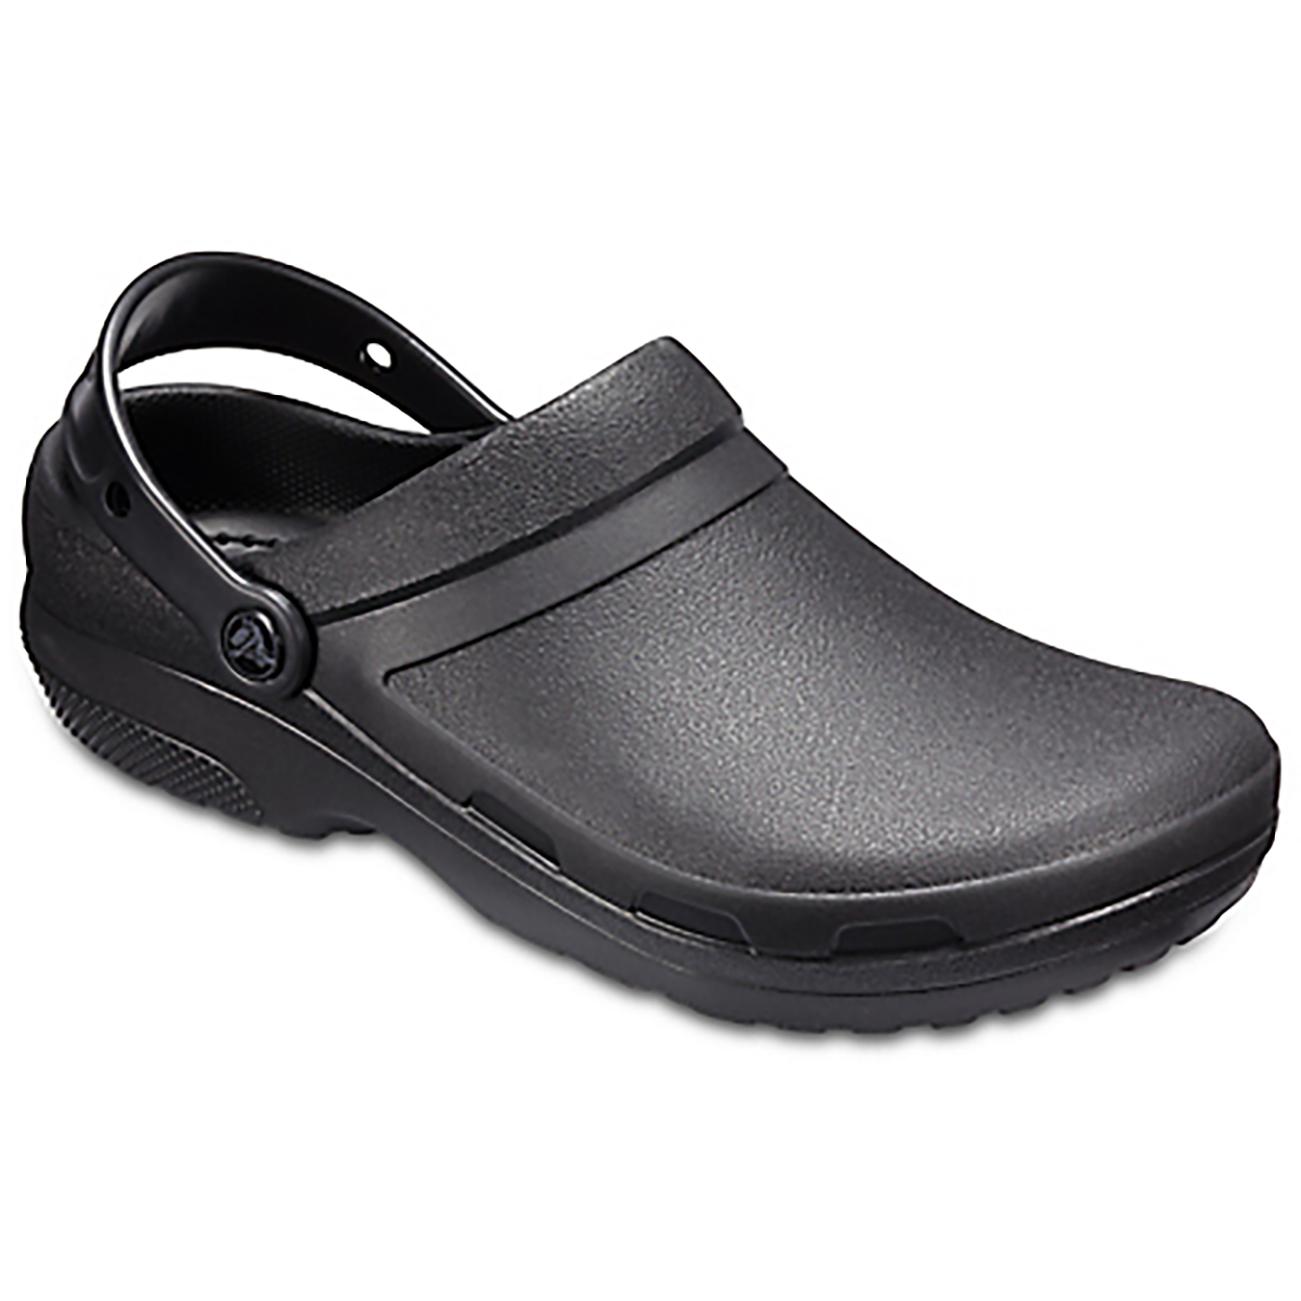 Unisex Adults Crocs Specialist II Clog